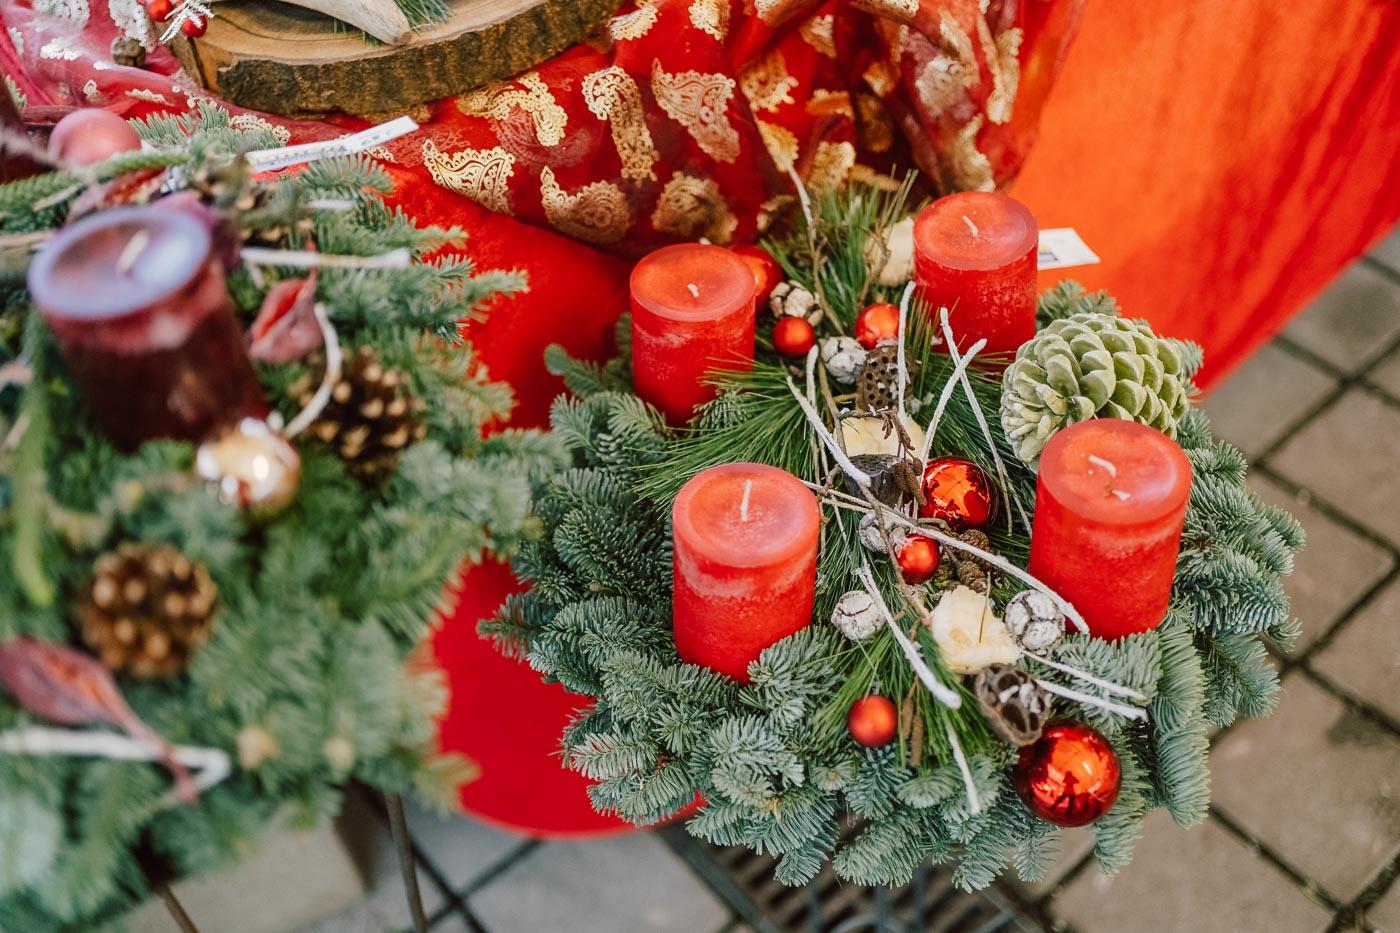 blumen-gaby-strohmeier-graz-saisonales-advent-23